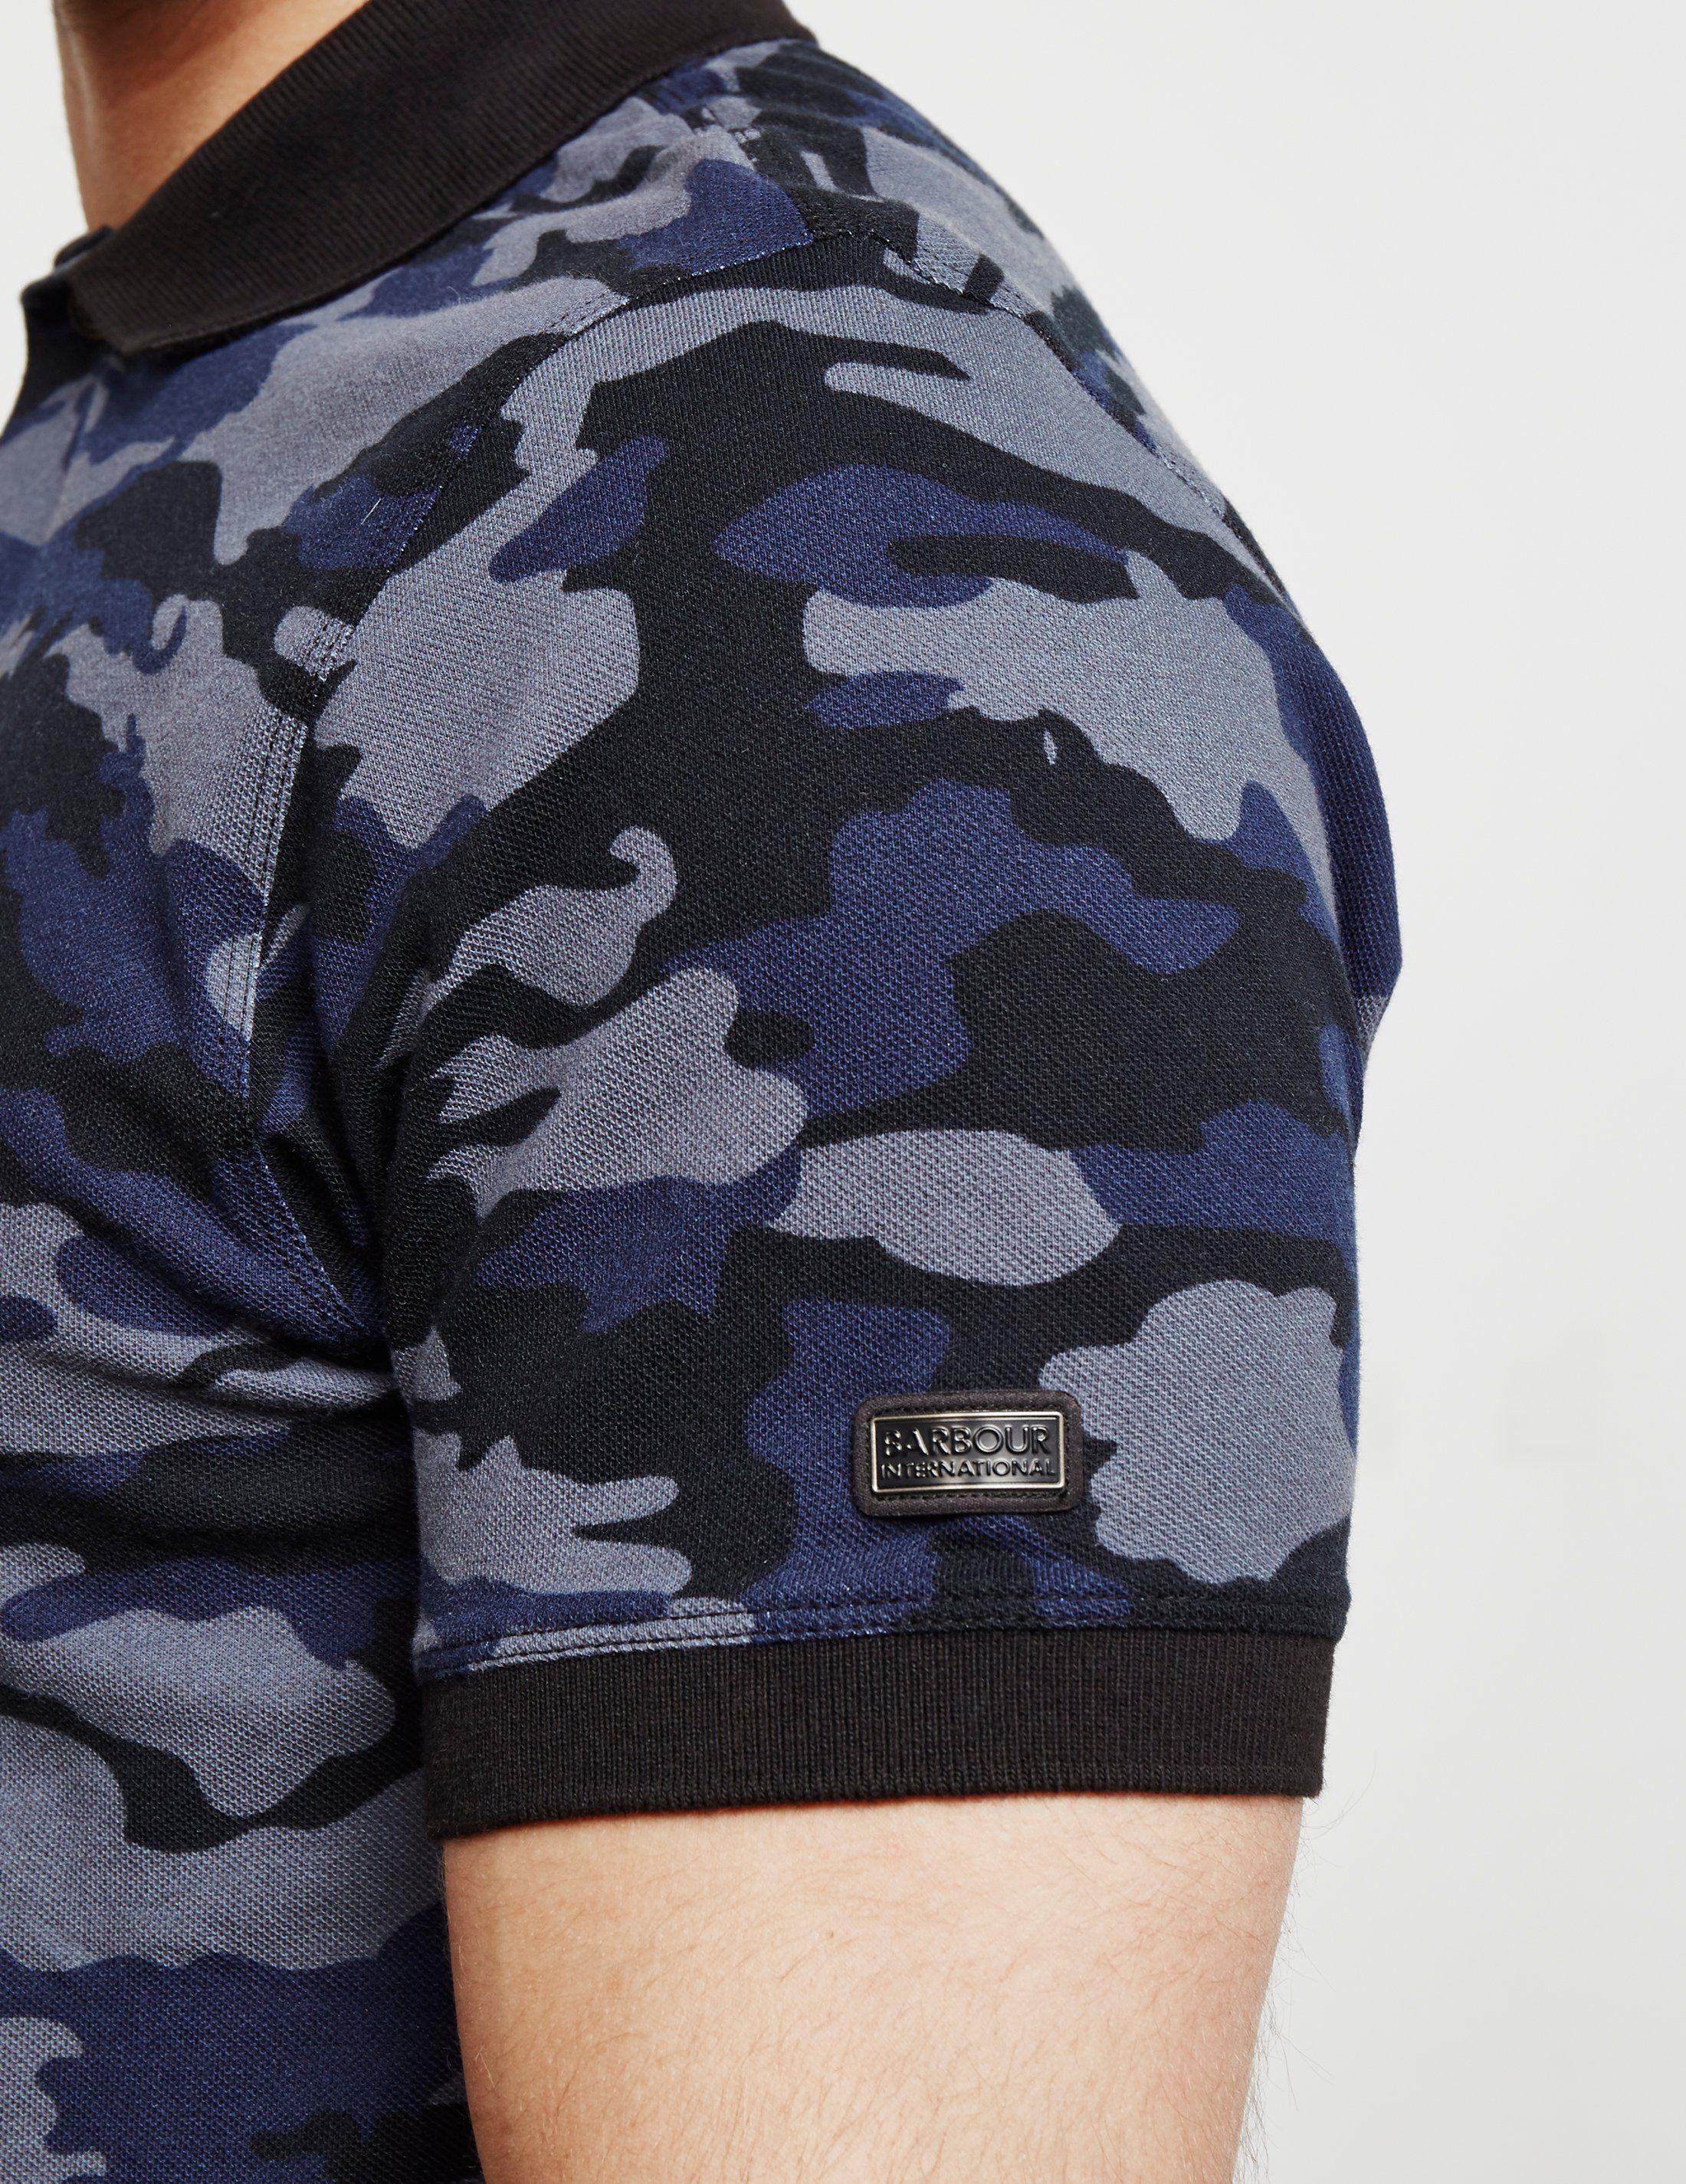 Barbour International Camo Short Sleeve Polo Shirt